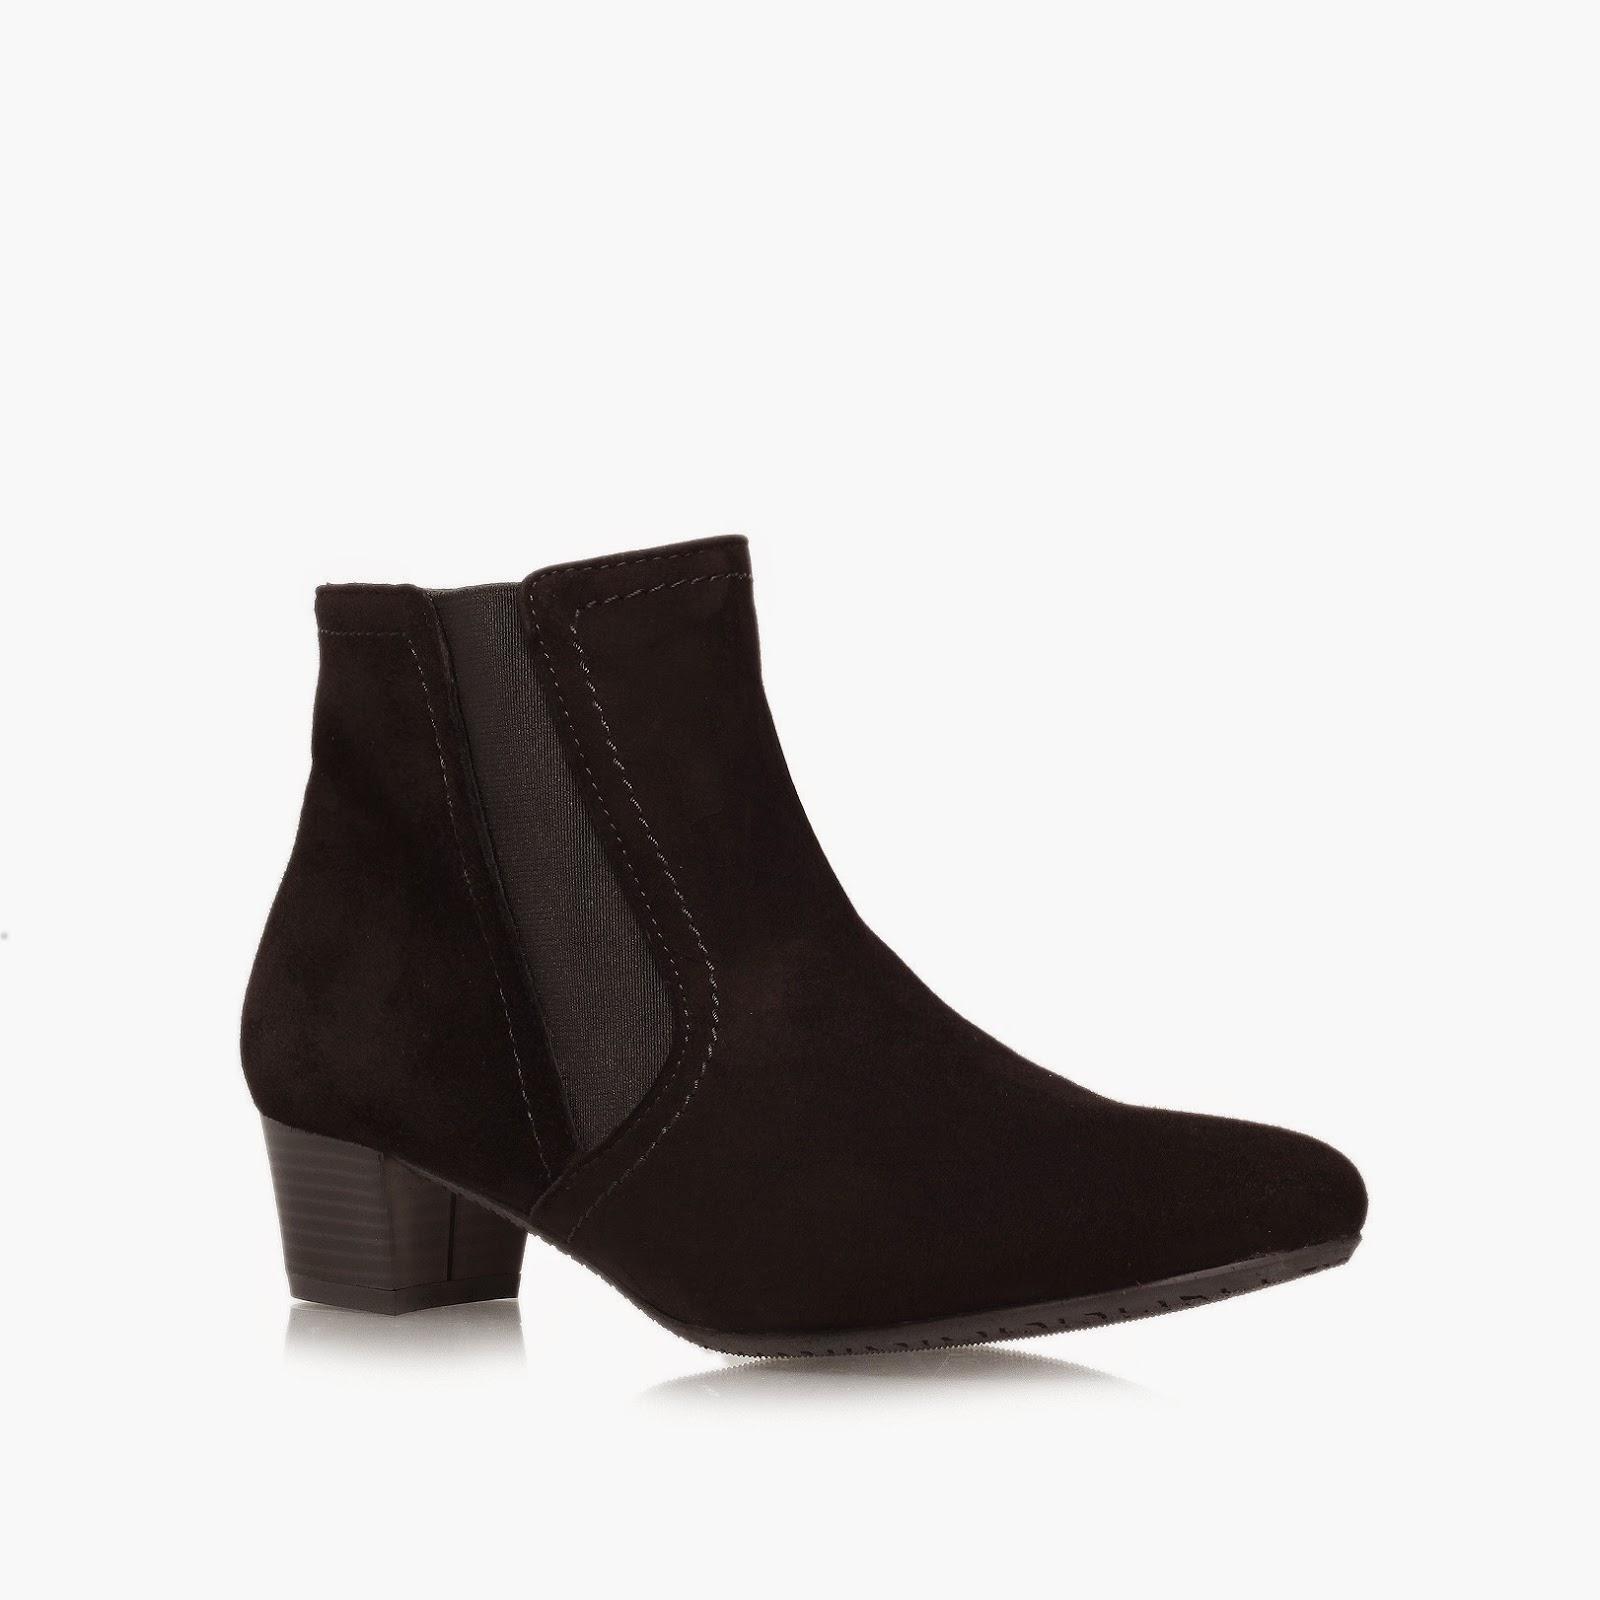 carvela black suede ankle boots